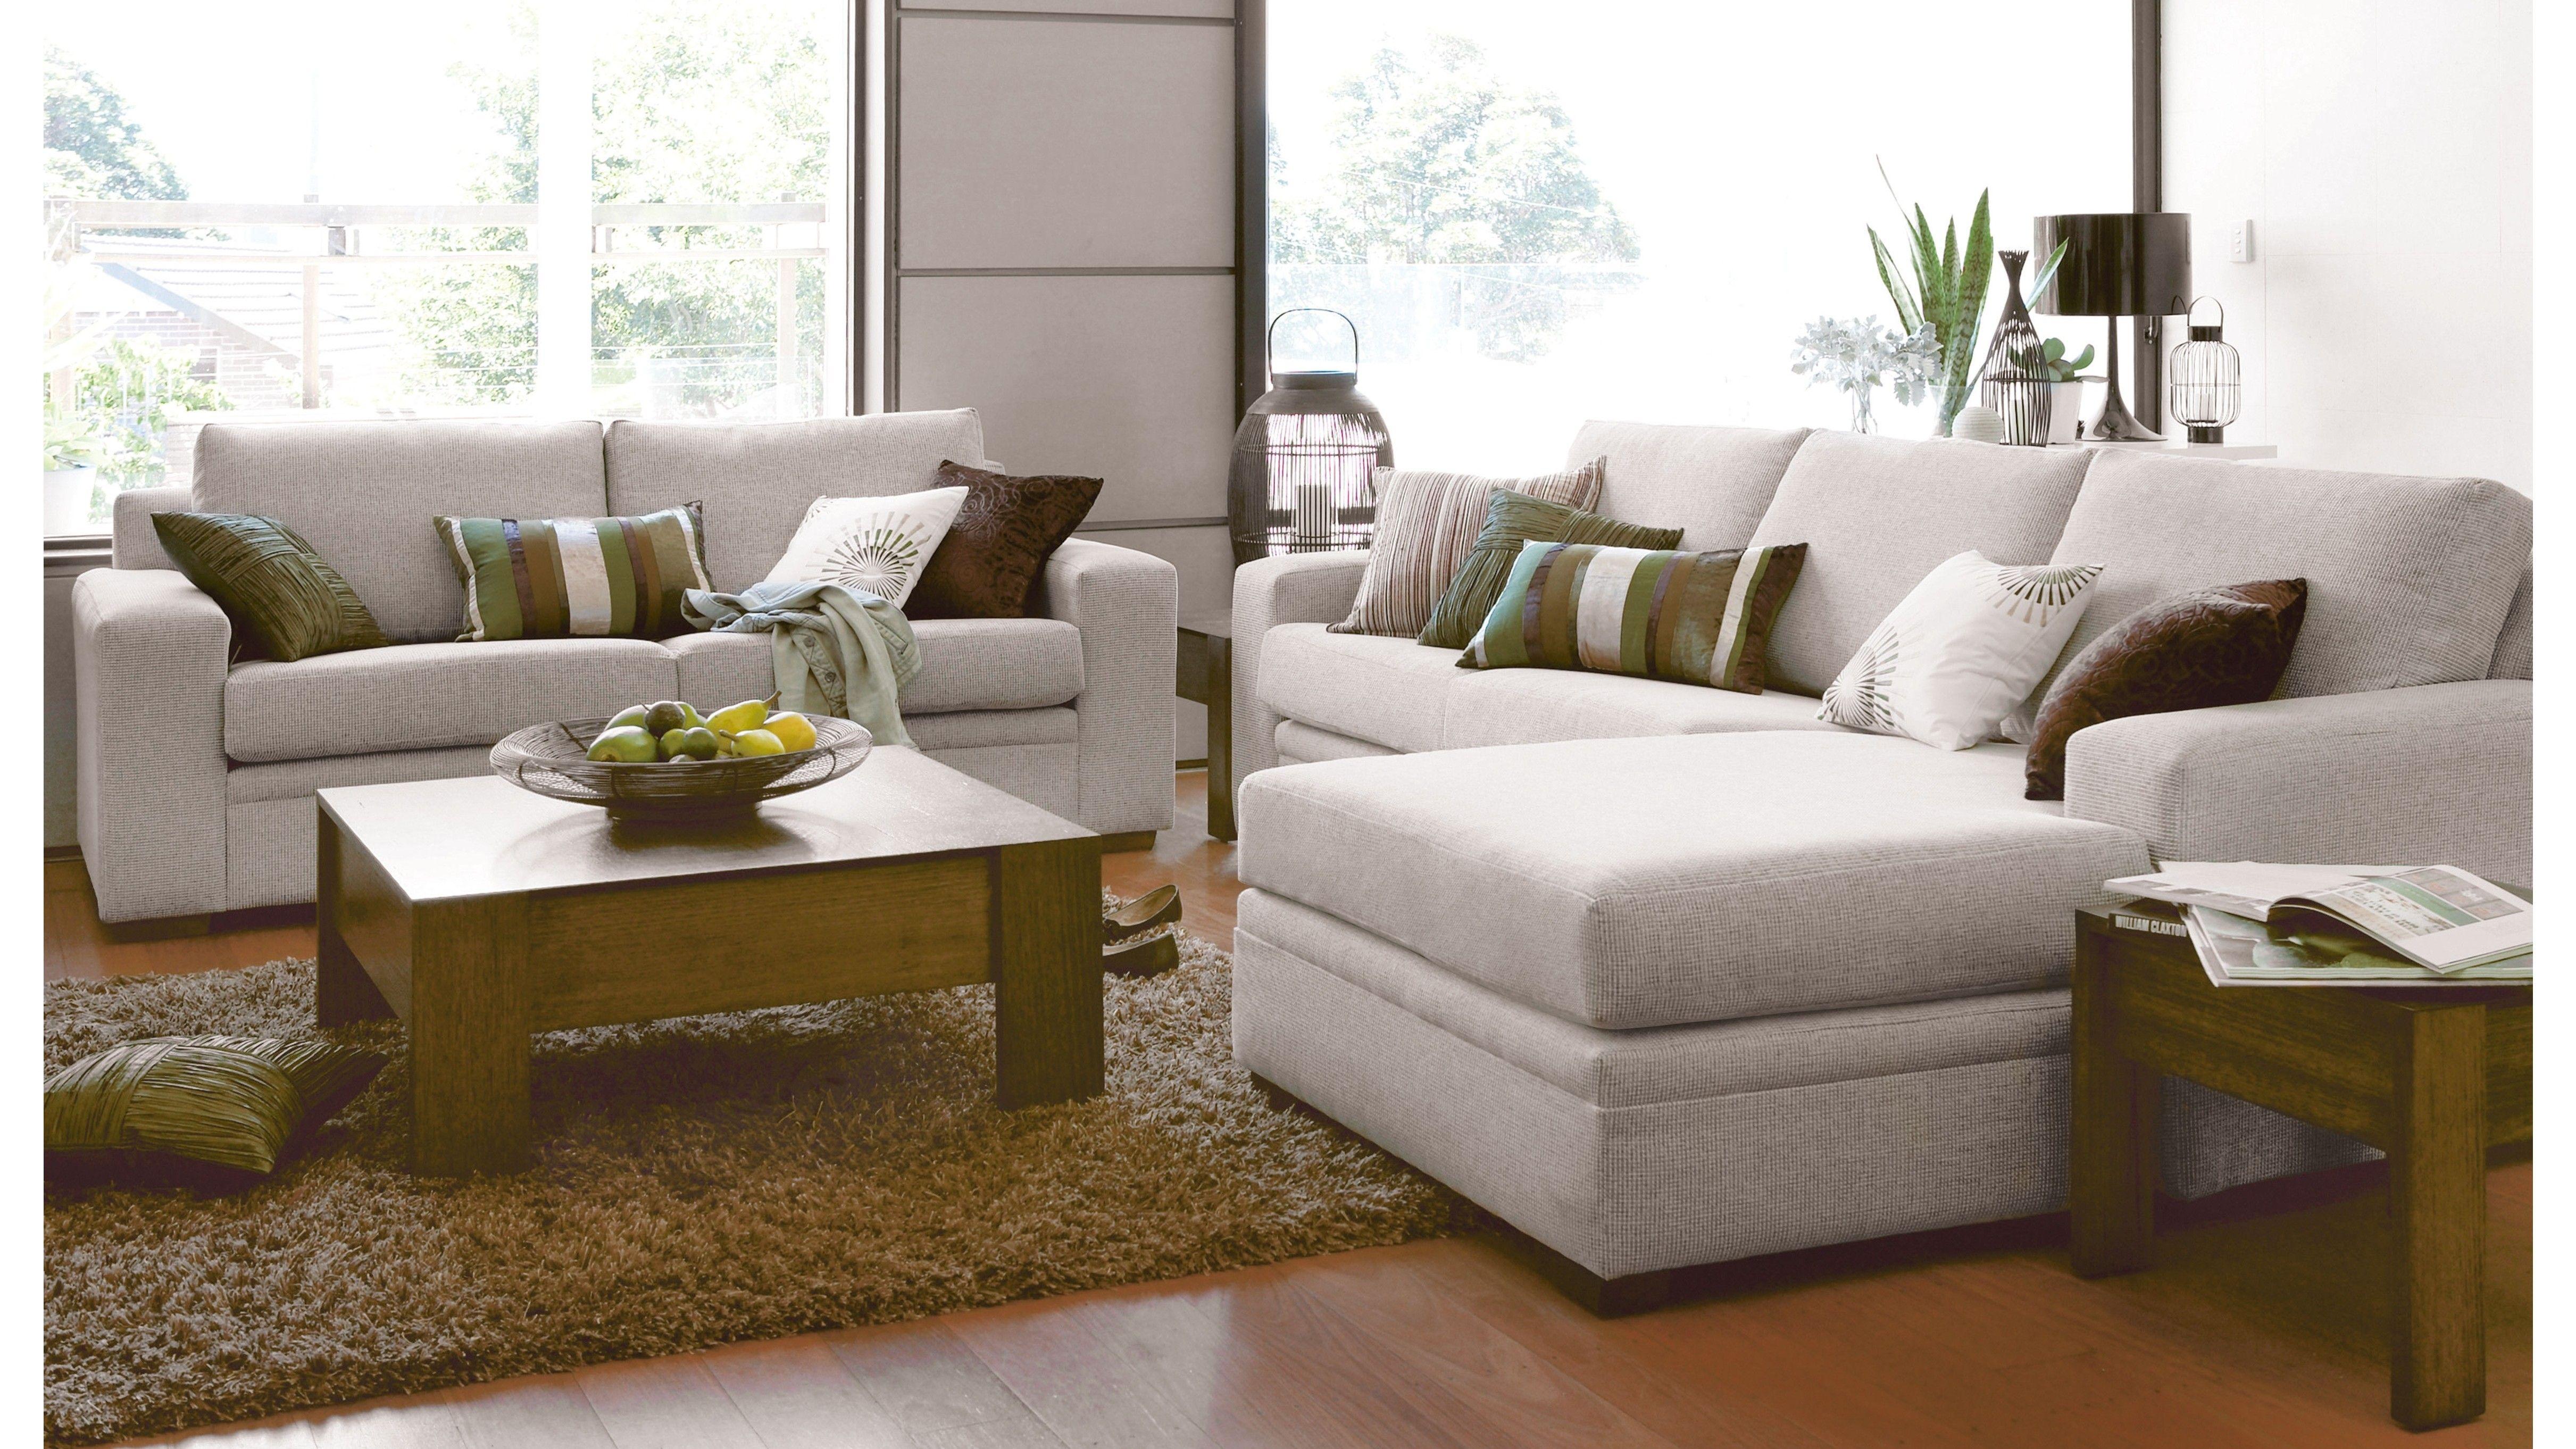 Sea be 3 5 Seater Sofa plus Chaise Home Ideas